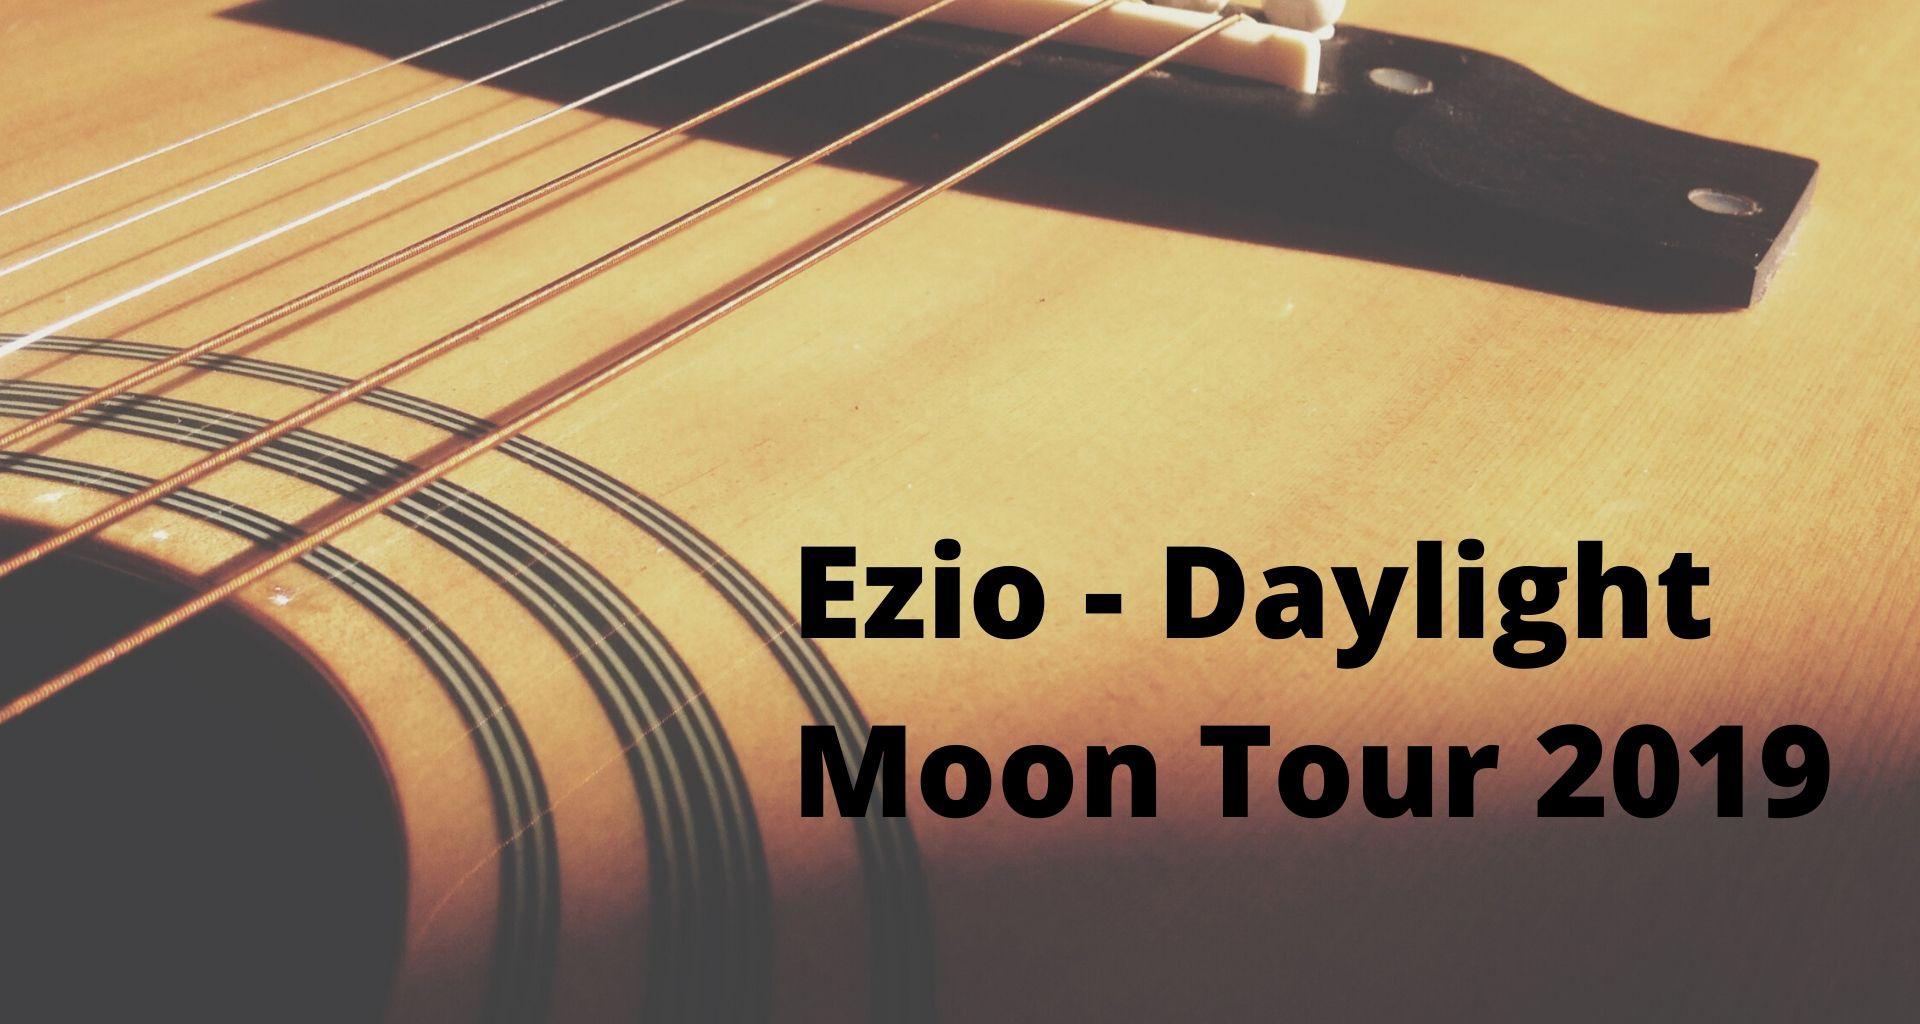 Top Event - Ezio – Daylight Moon Tour 2019